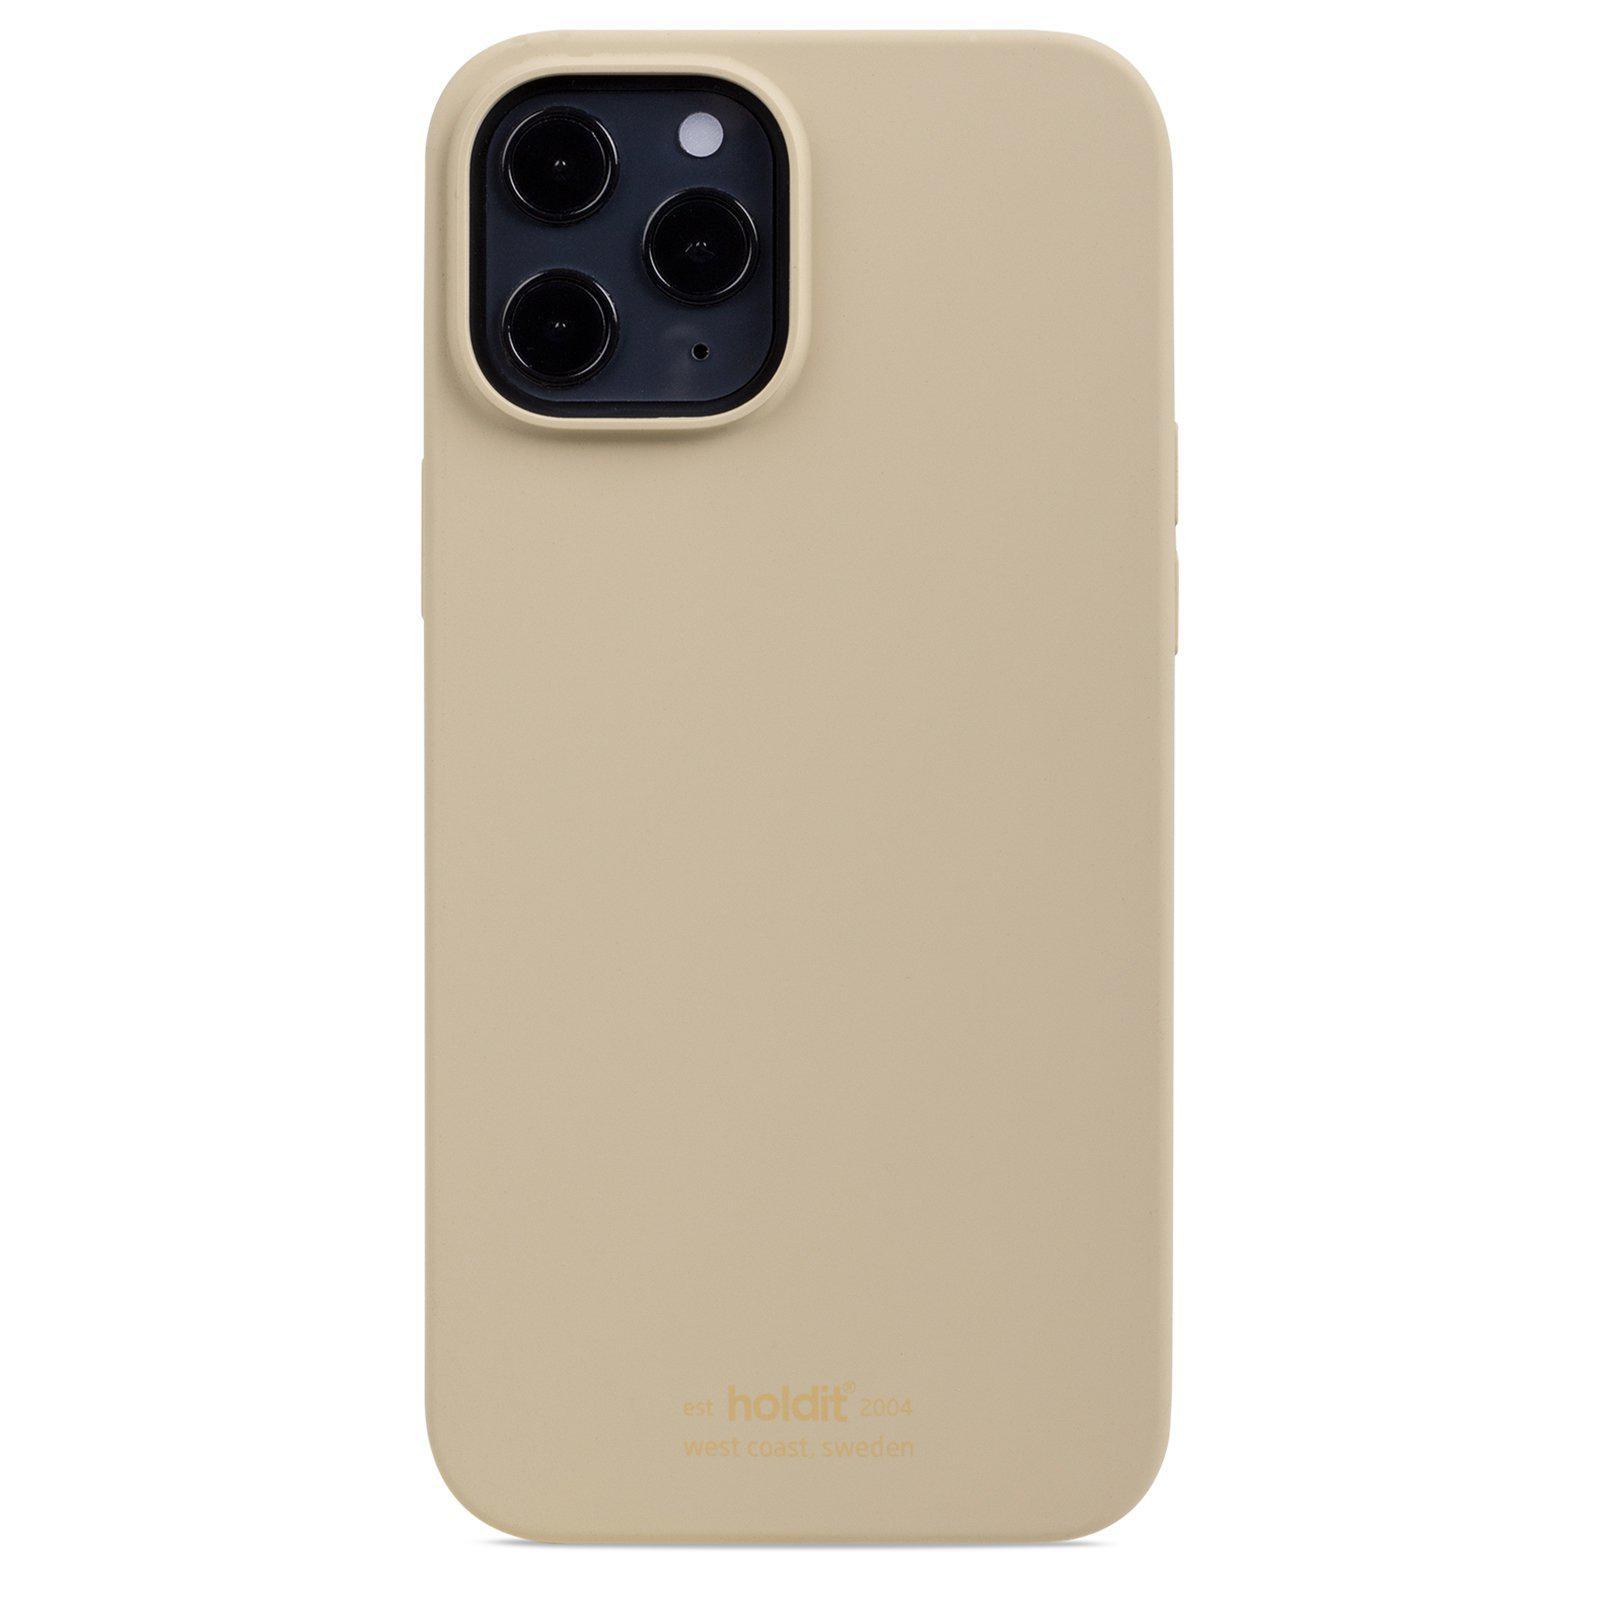 Silikonskal iPhone 12 Pro Max Beige